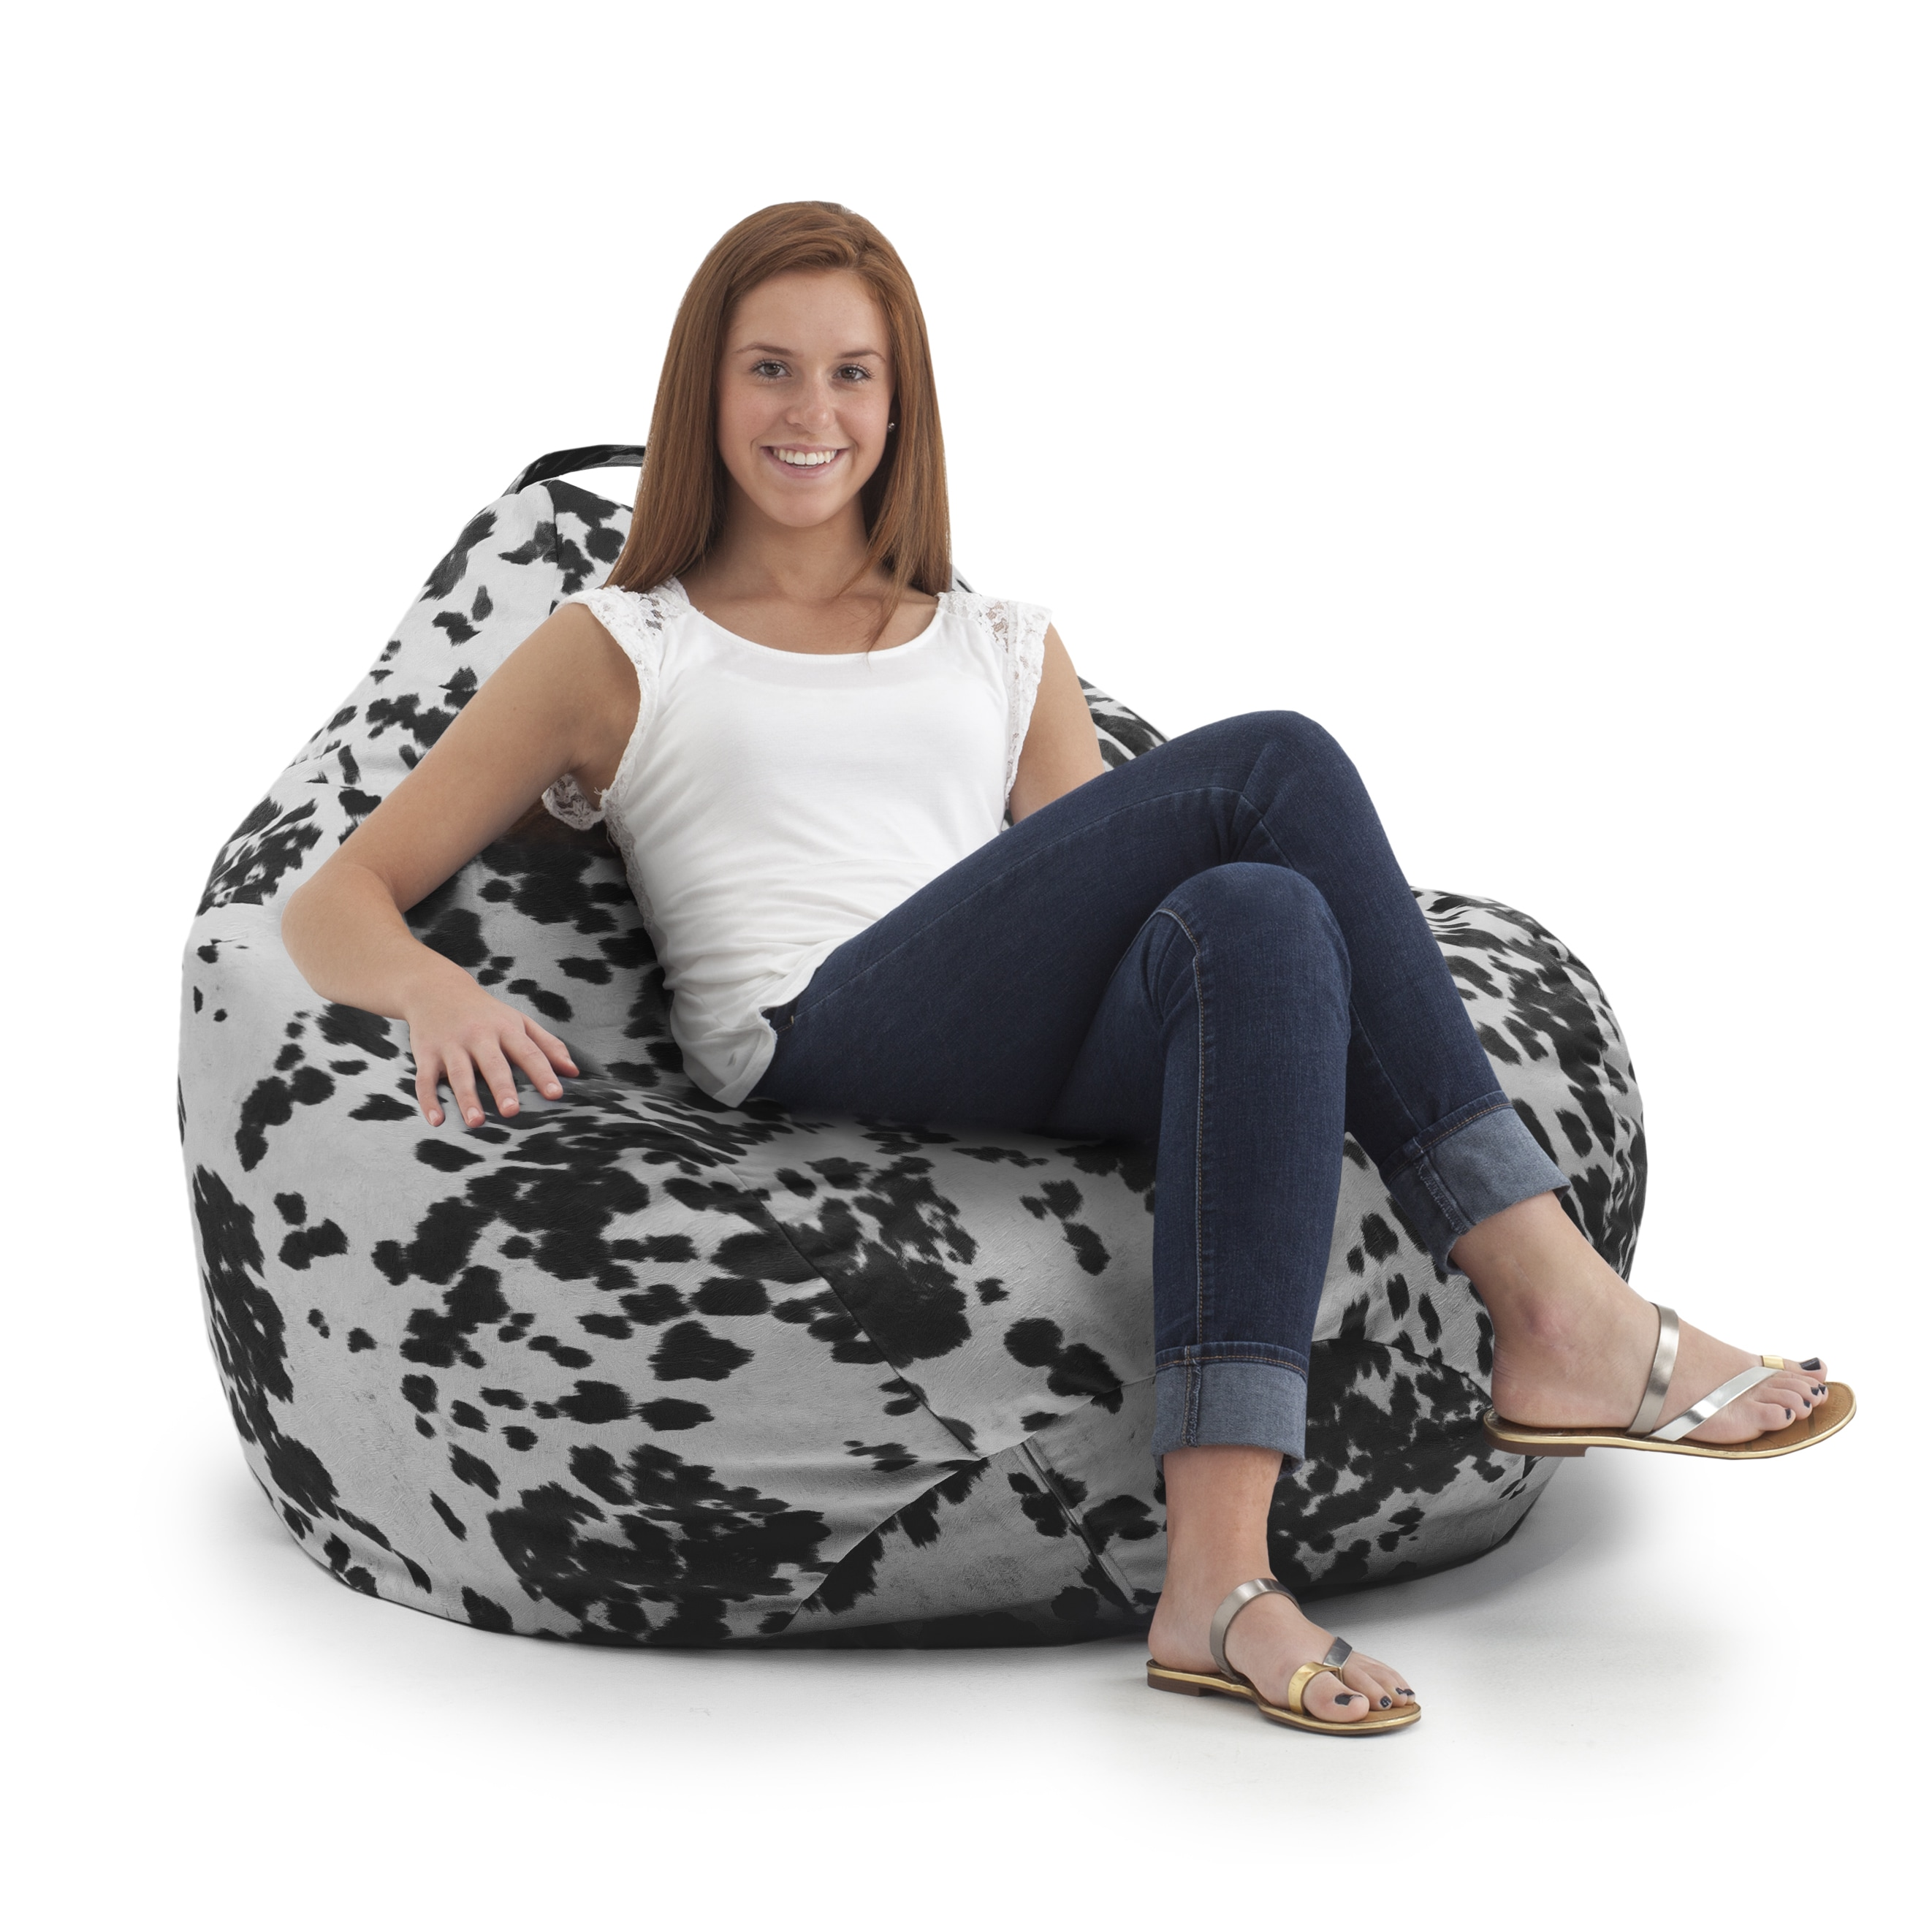 BeanSack Big Joe Cow Print Teardrop Bean Bag Chair